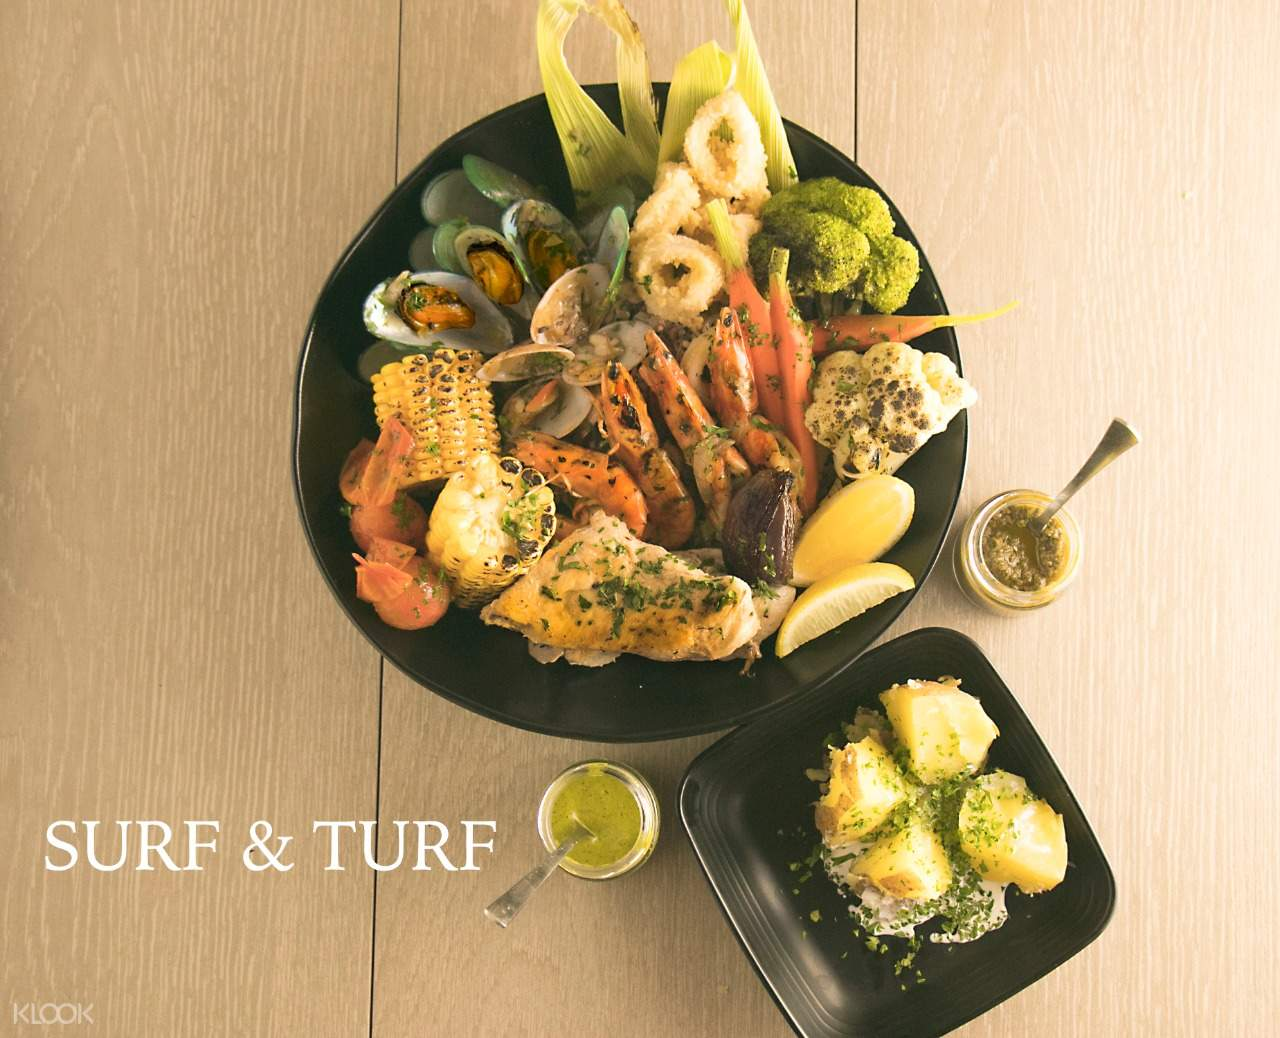 cebu ocean park aqua dining surf and turf